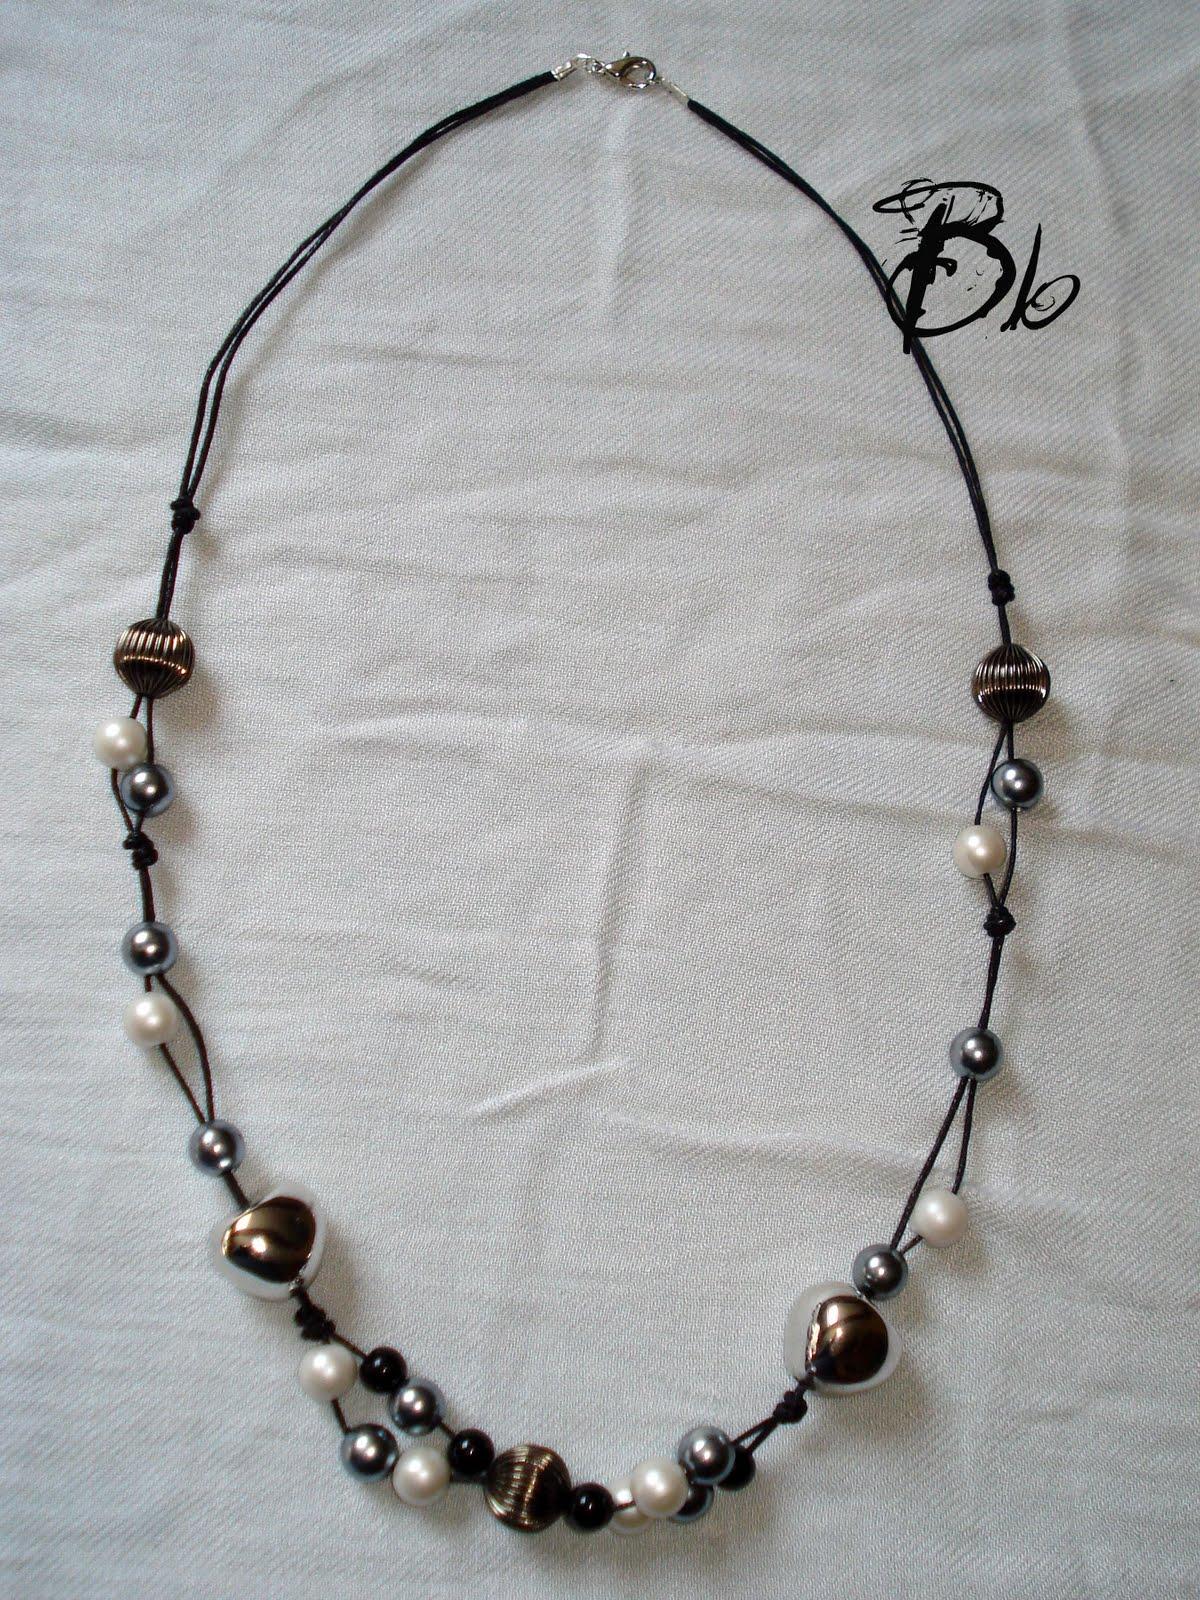 Extrêmement ღ Brenda's bijoux ღ: Collane SG31